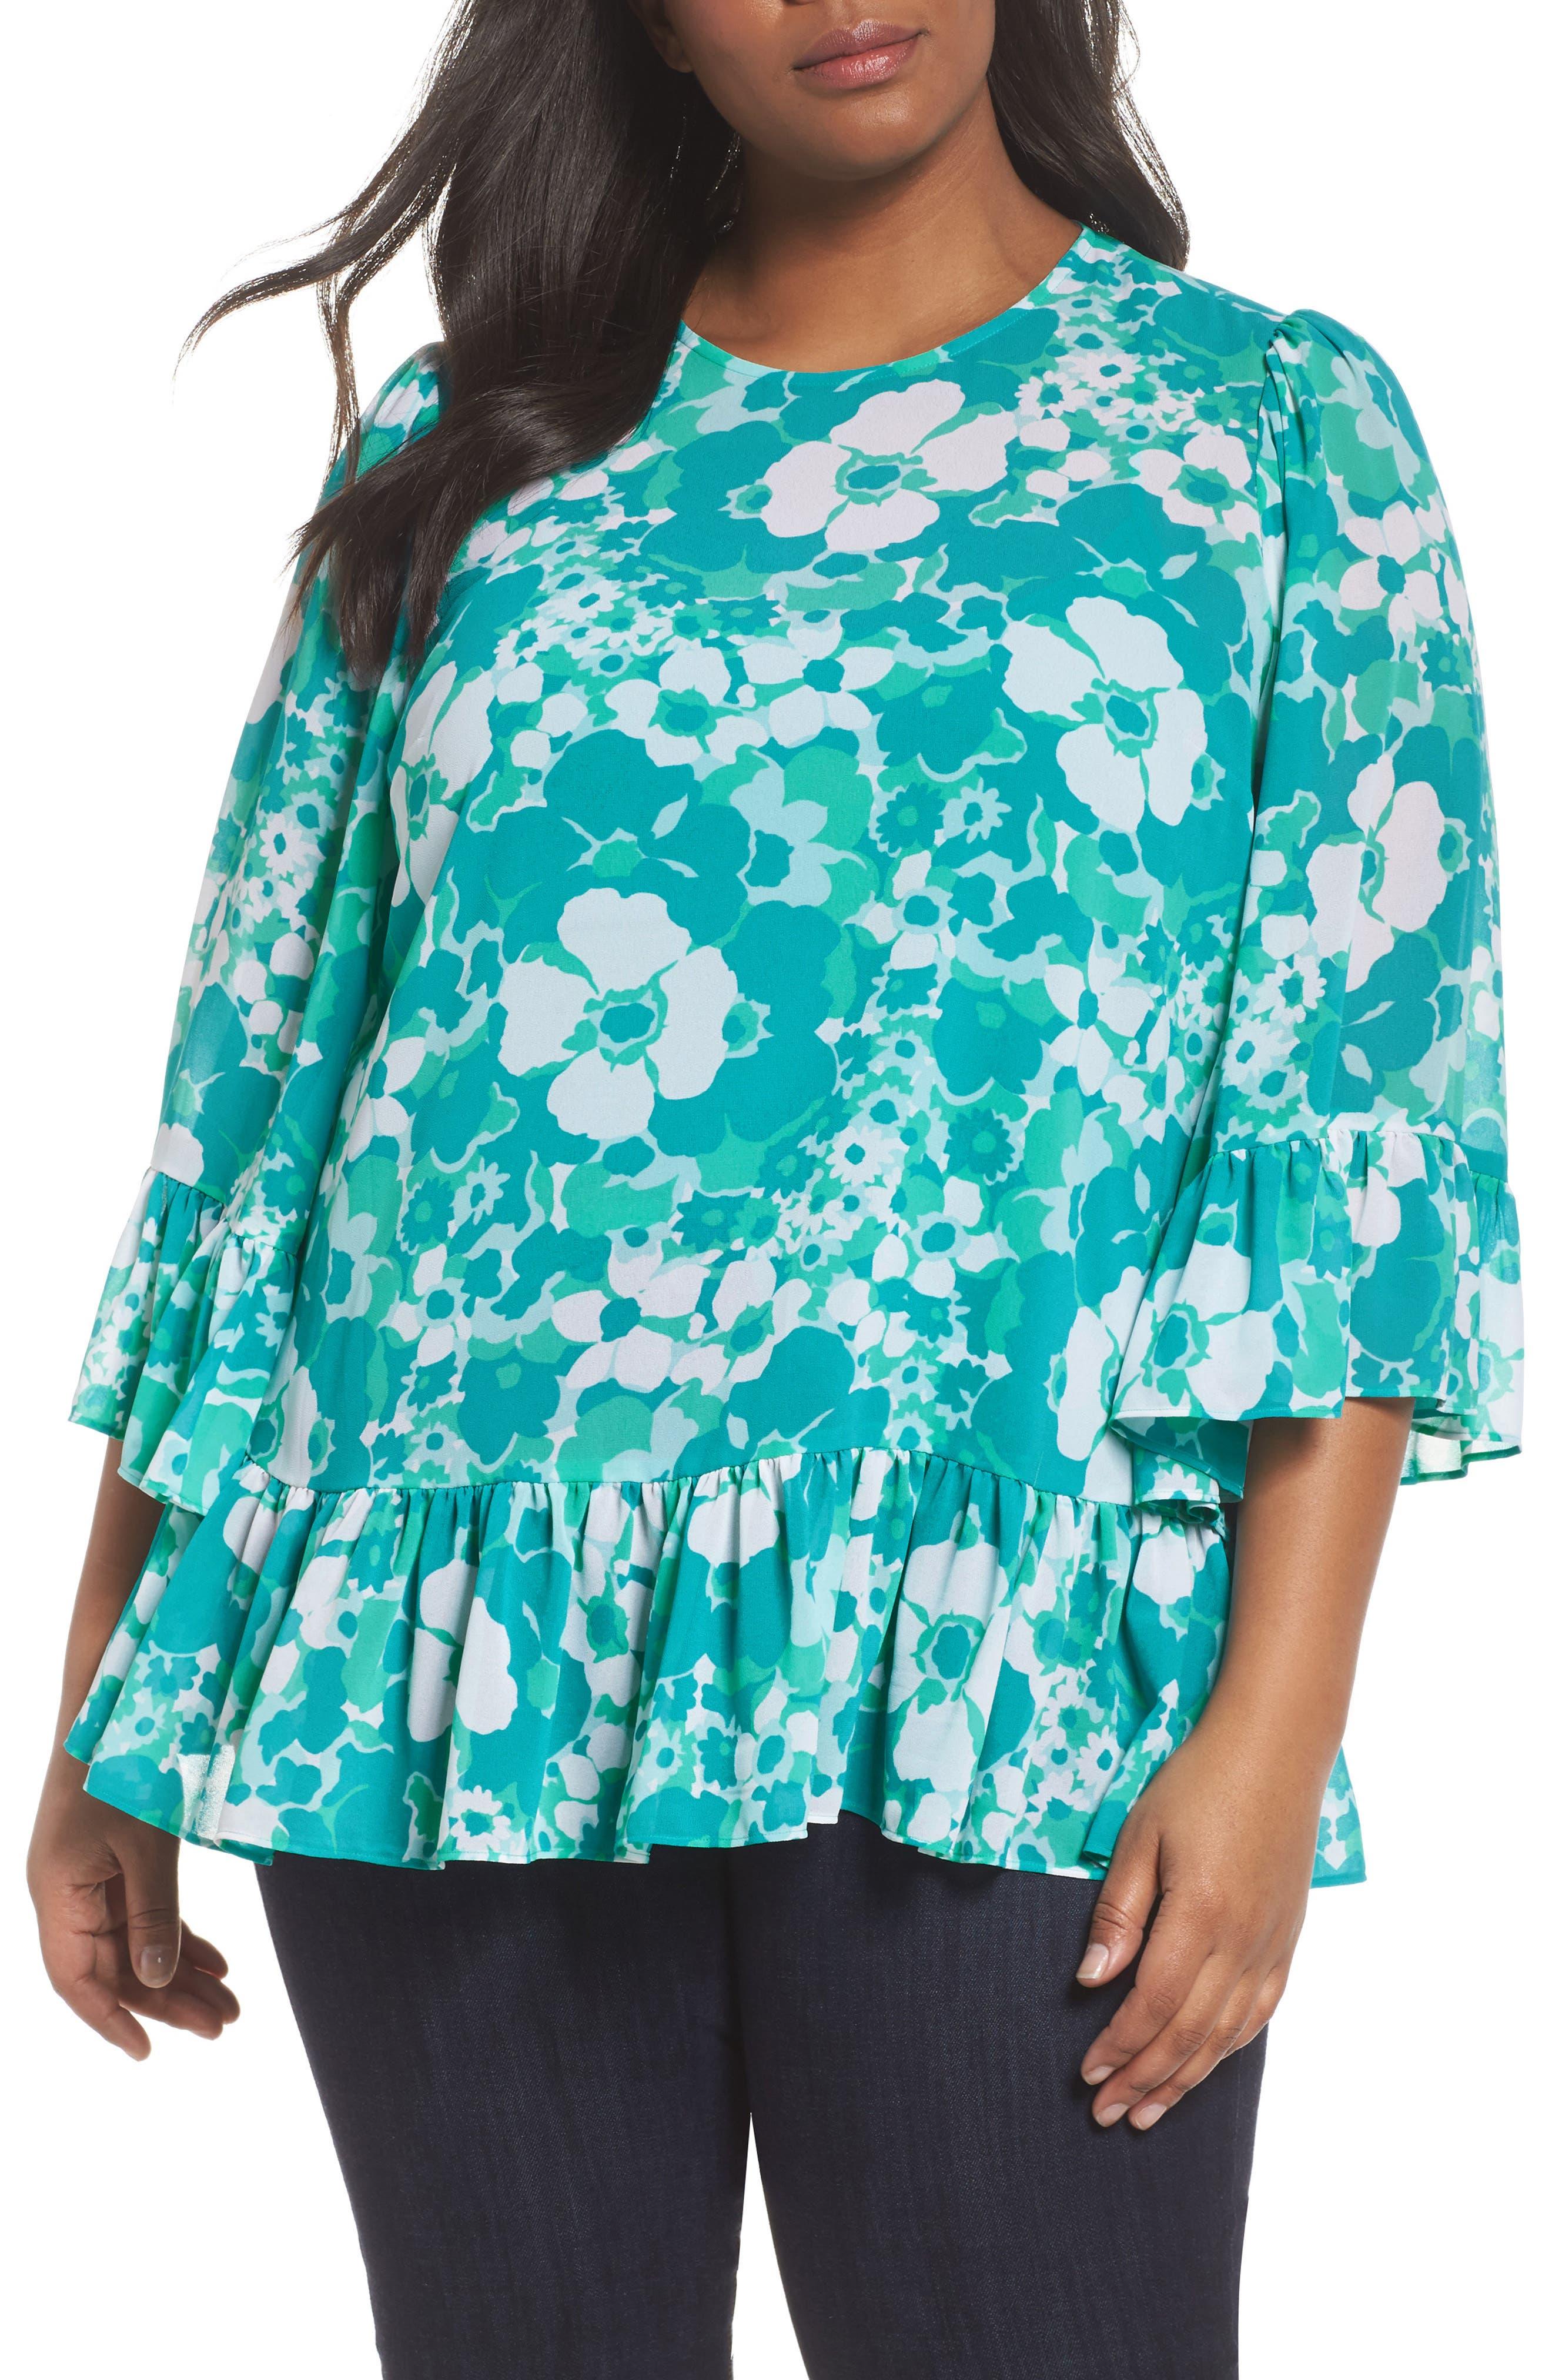 Alternate Image 1 Selected - MICHAEL Michael Kors Springtime Floral Ruffle Top (Plus Size)